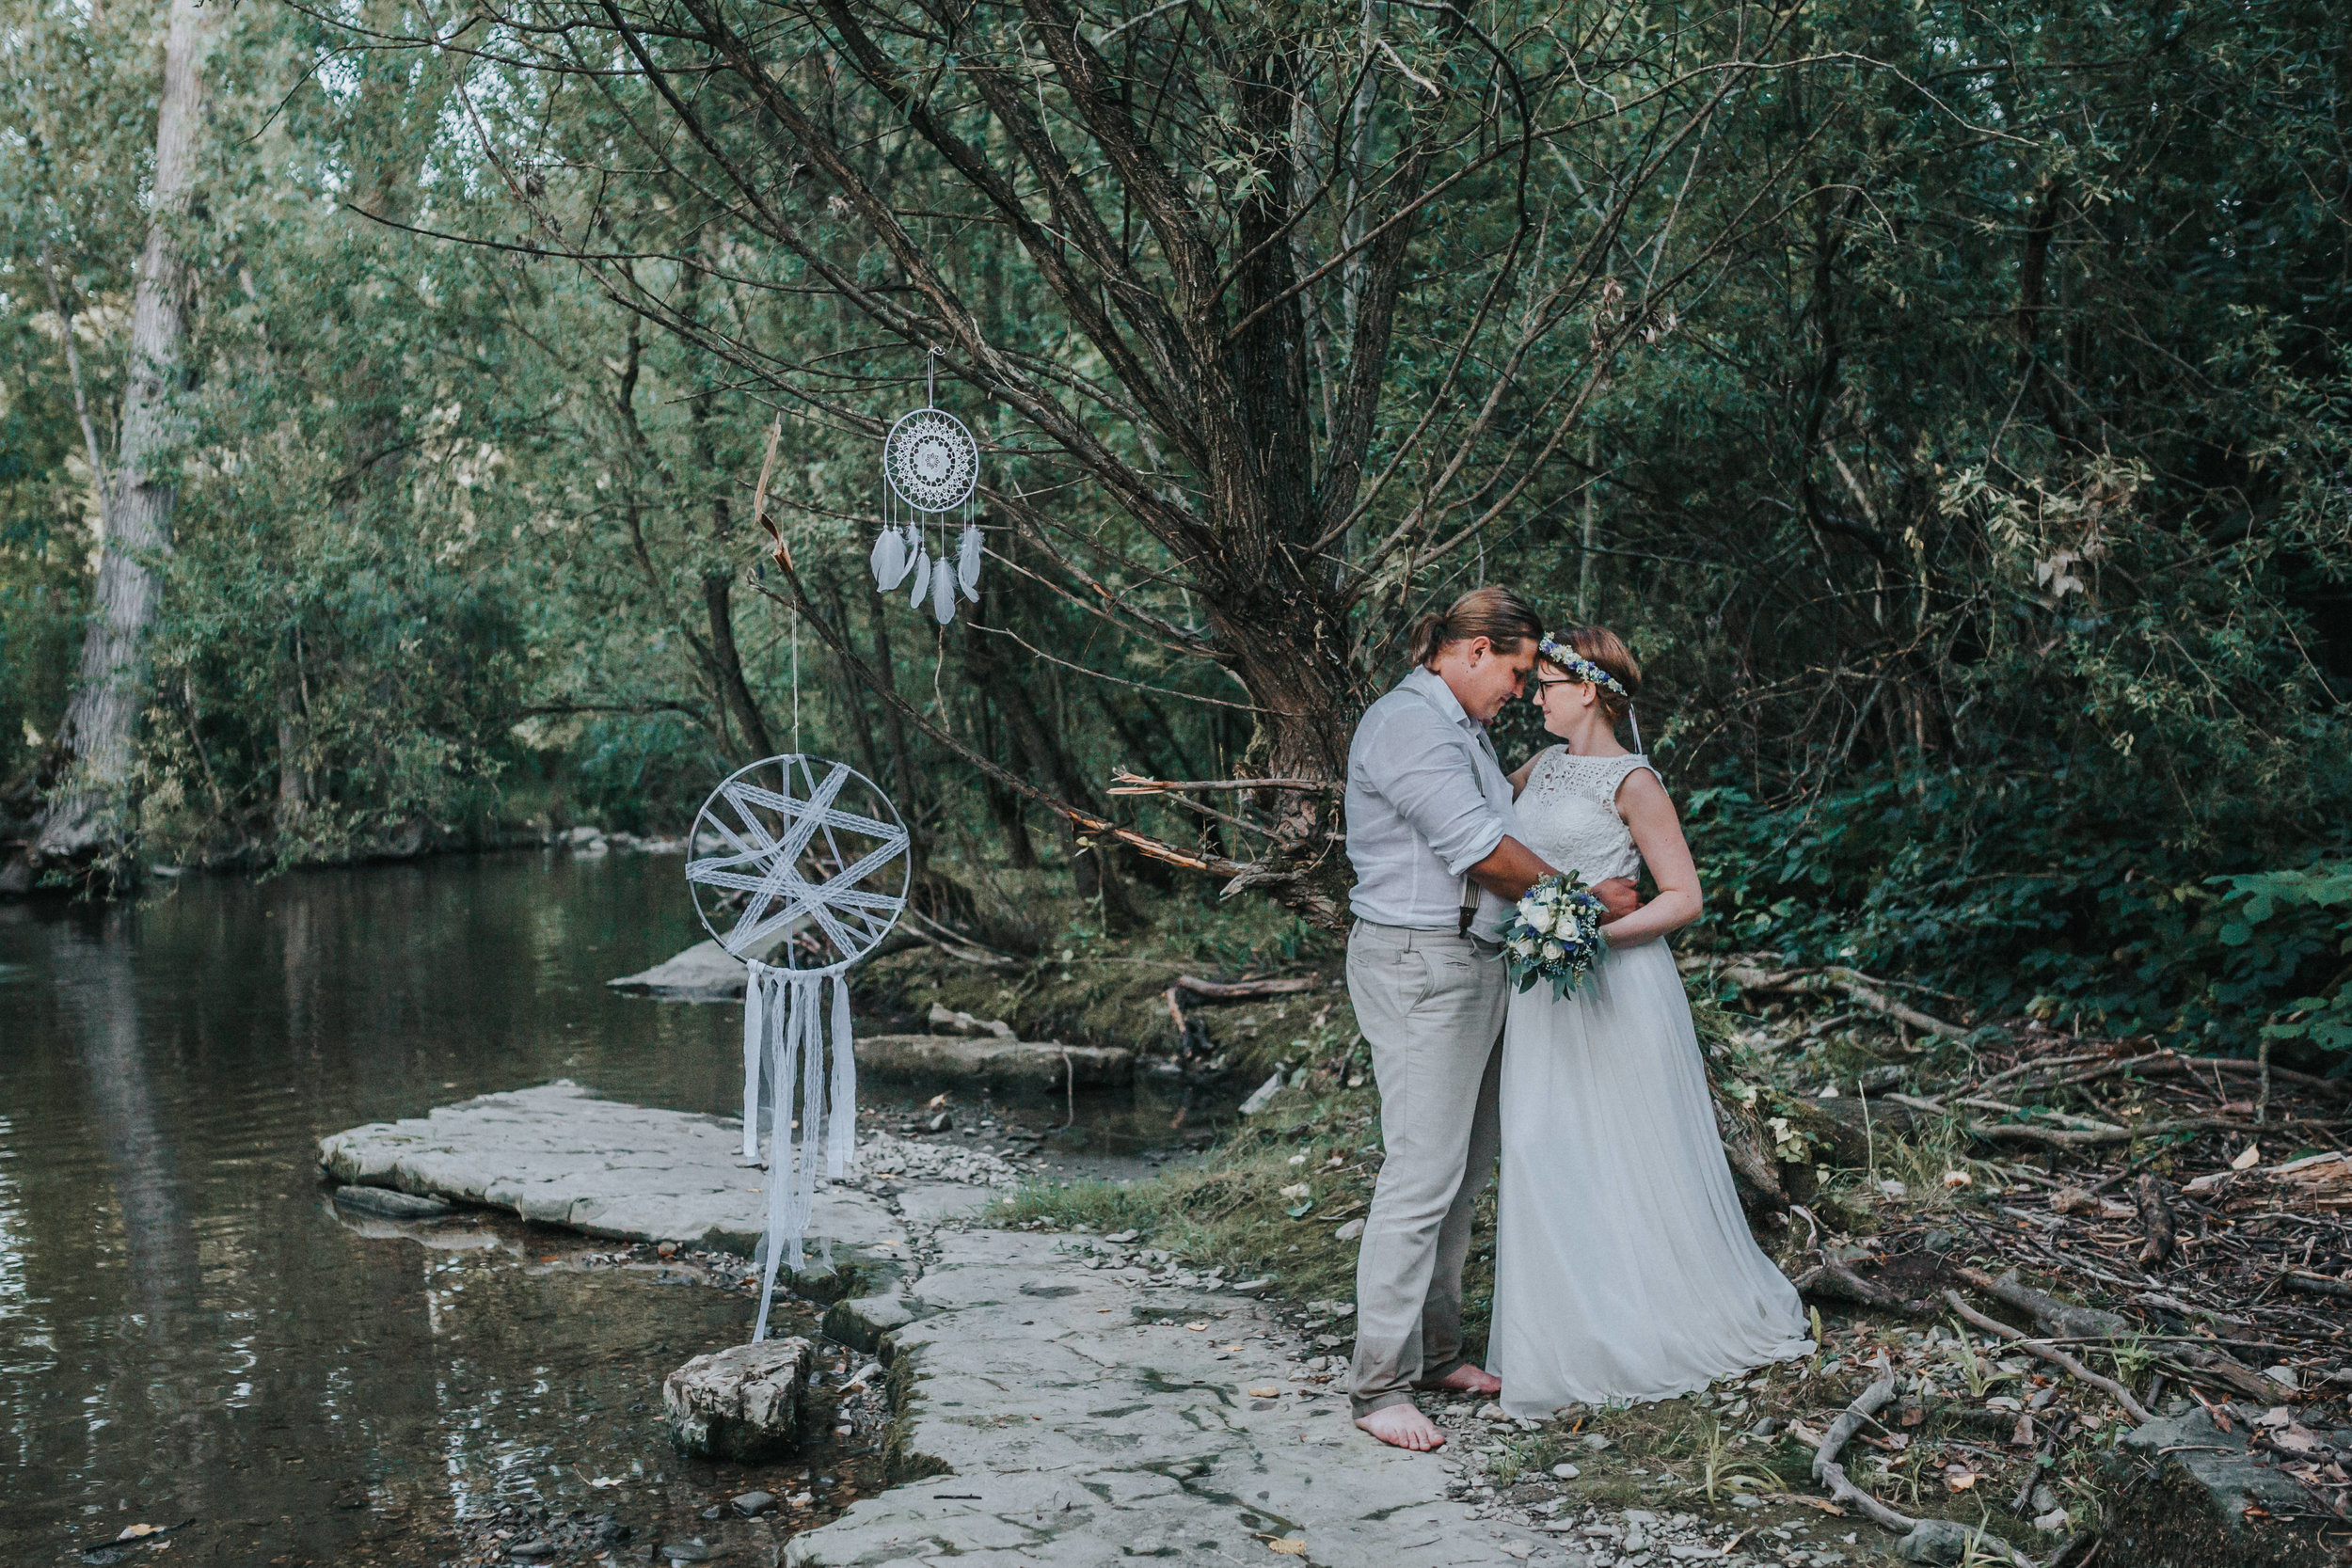 yessica-baur-fotografie-after-wedding-tübingen-122-1278.JPG